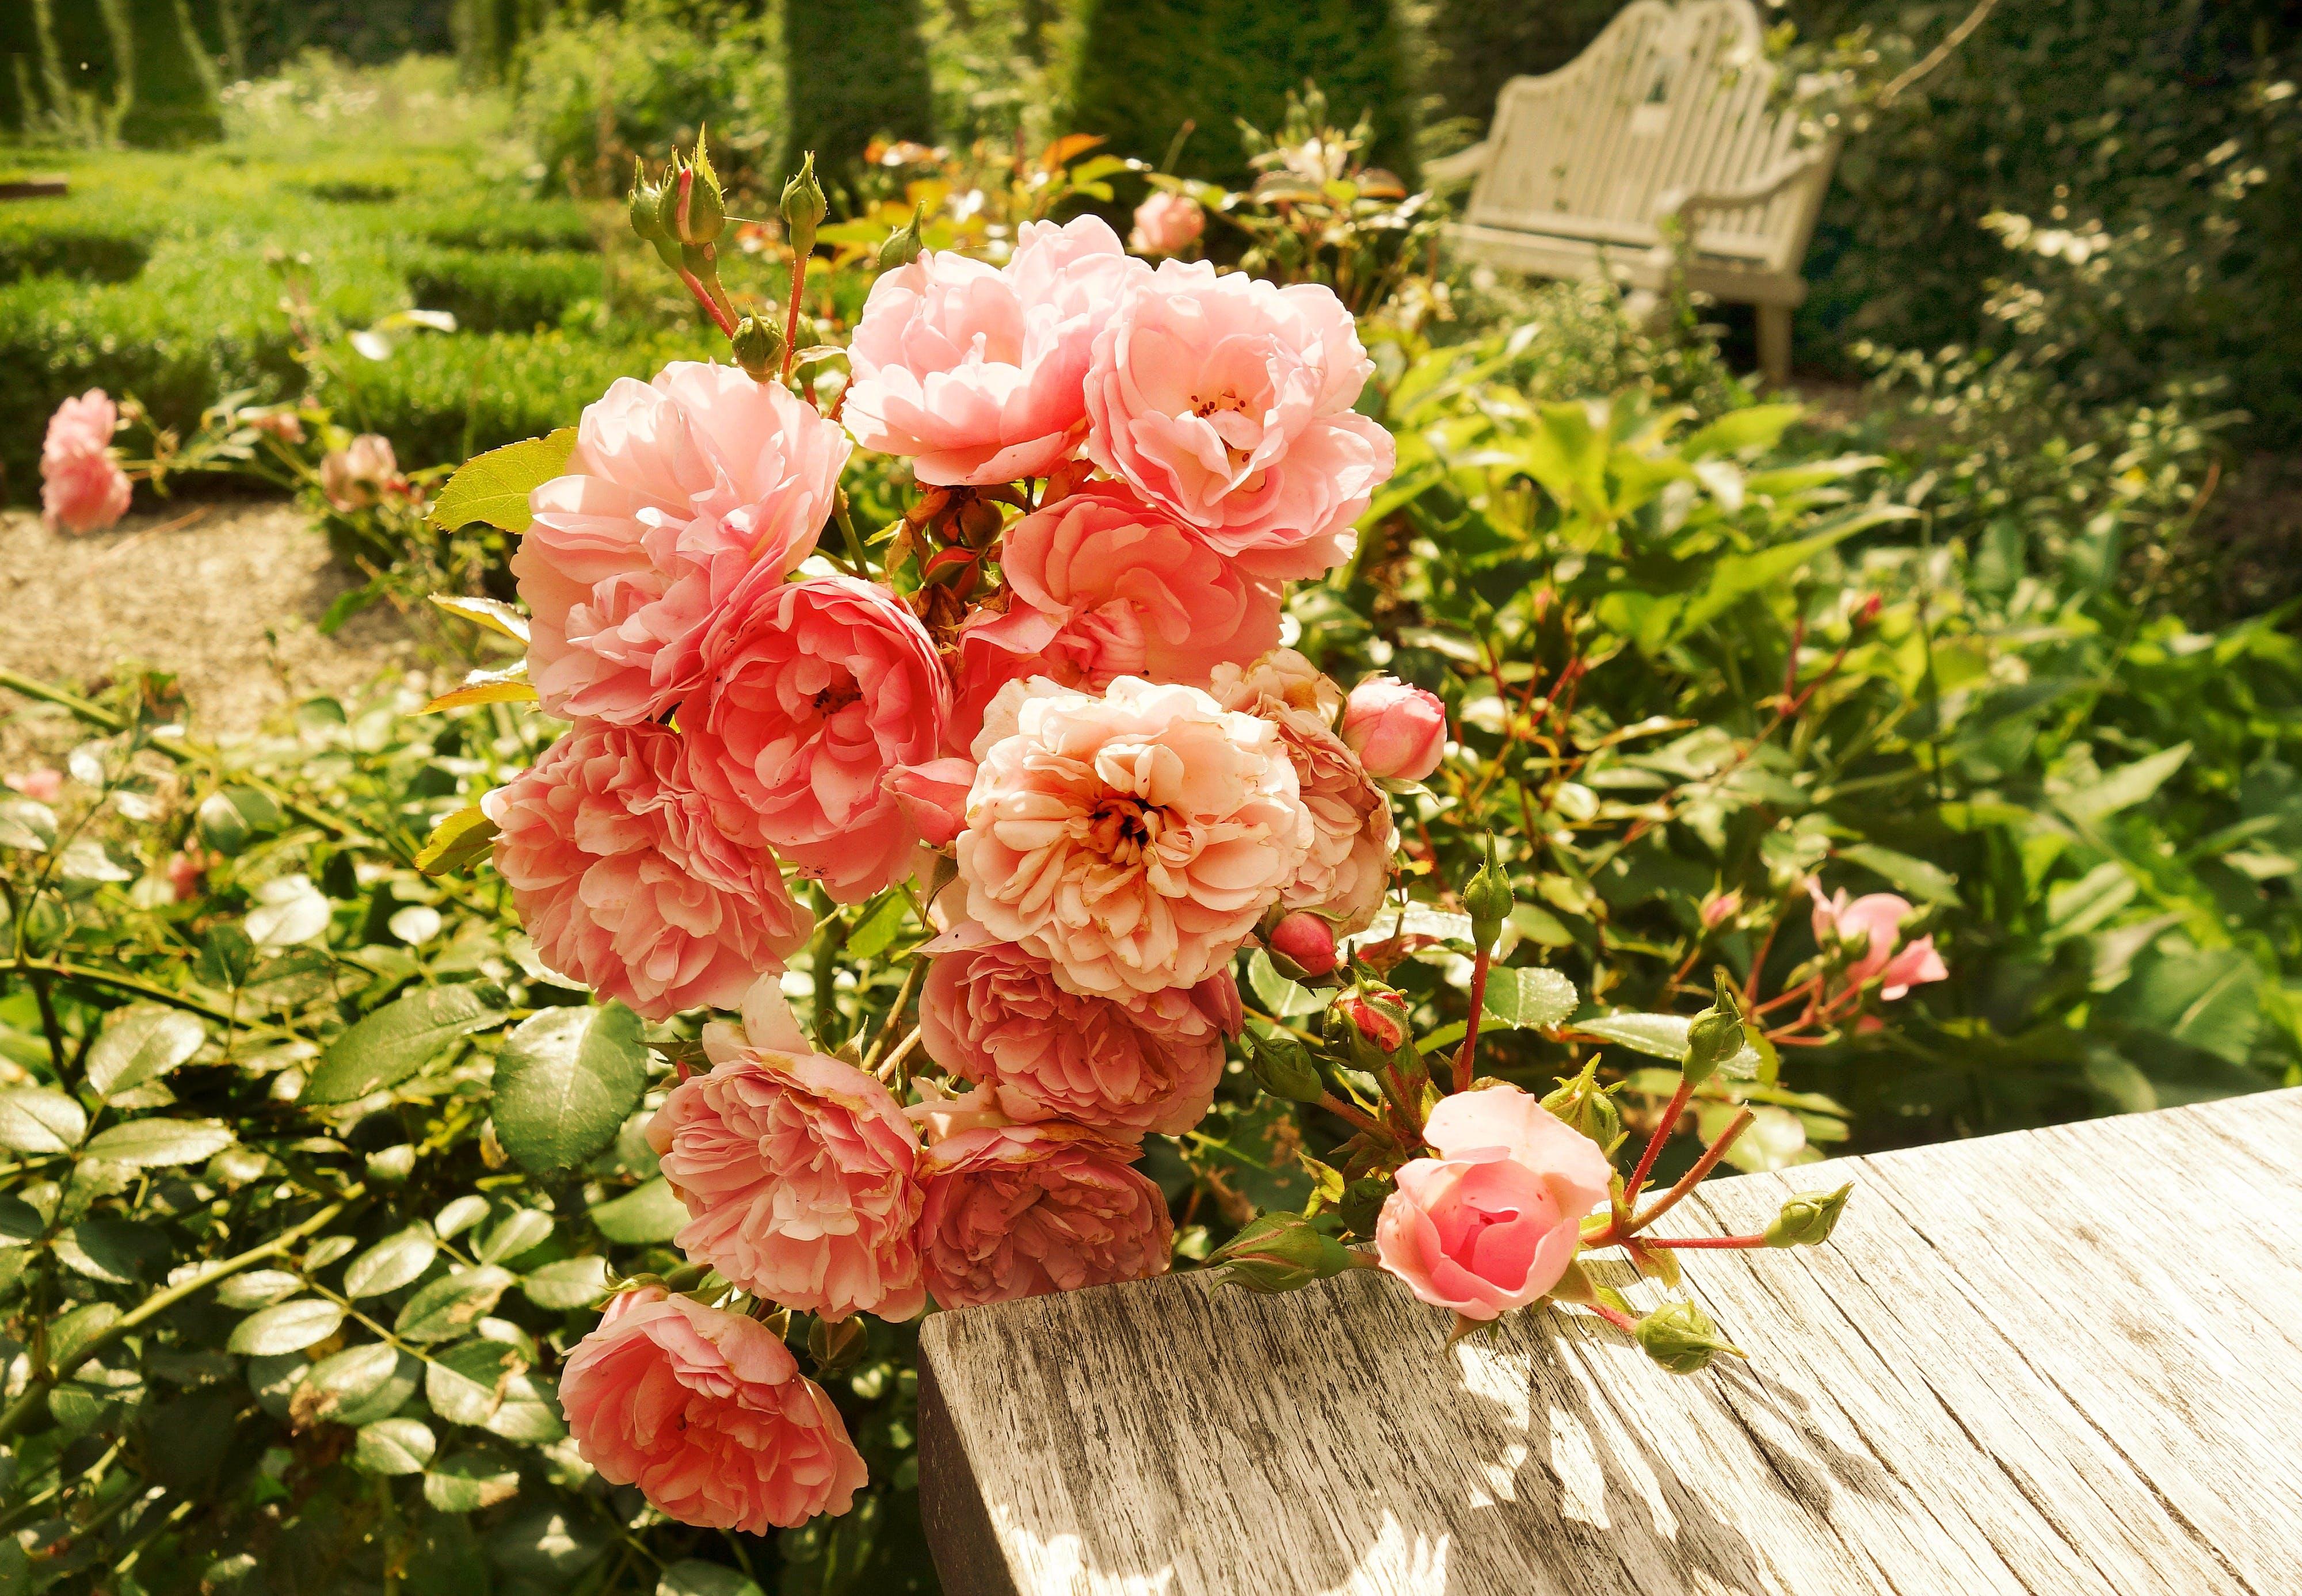 Free stock photo of sunshine, garden, plant, table